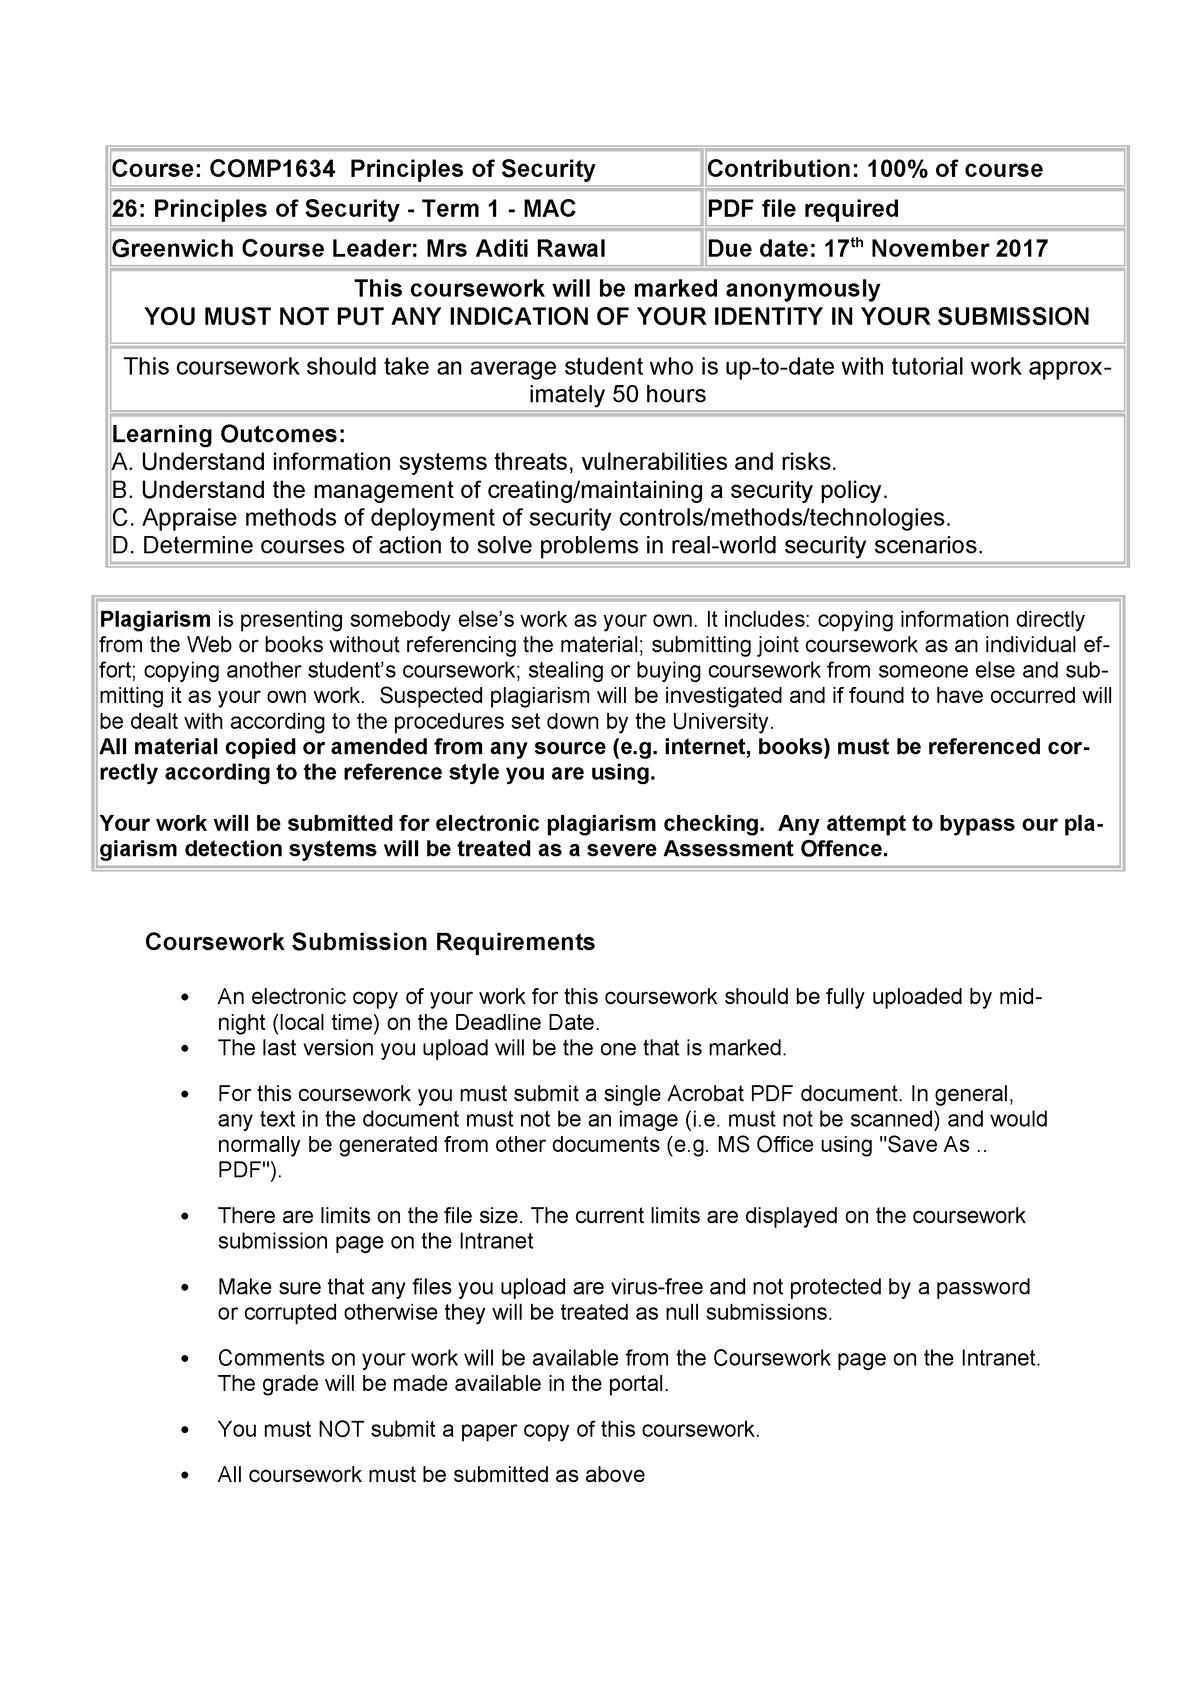 CW COMP1634 26 ver3 1718 - COMP1634: Principles of Security